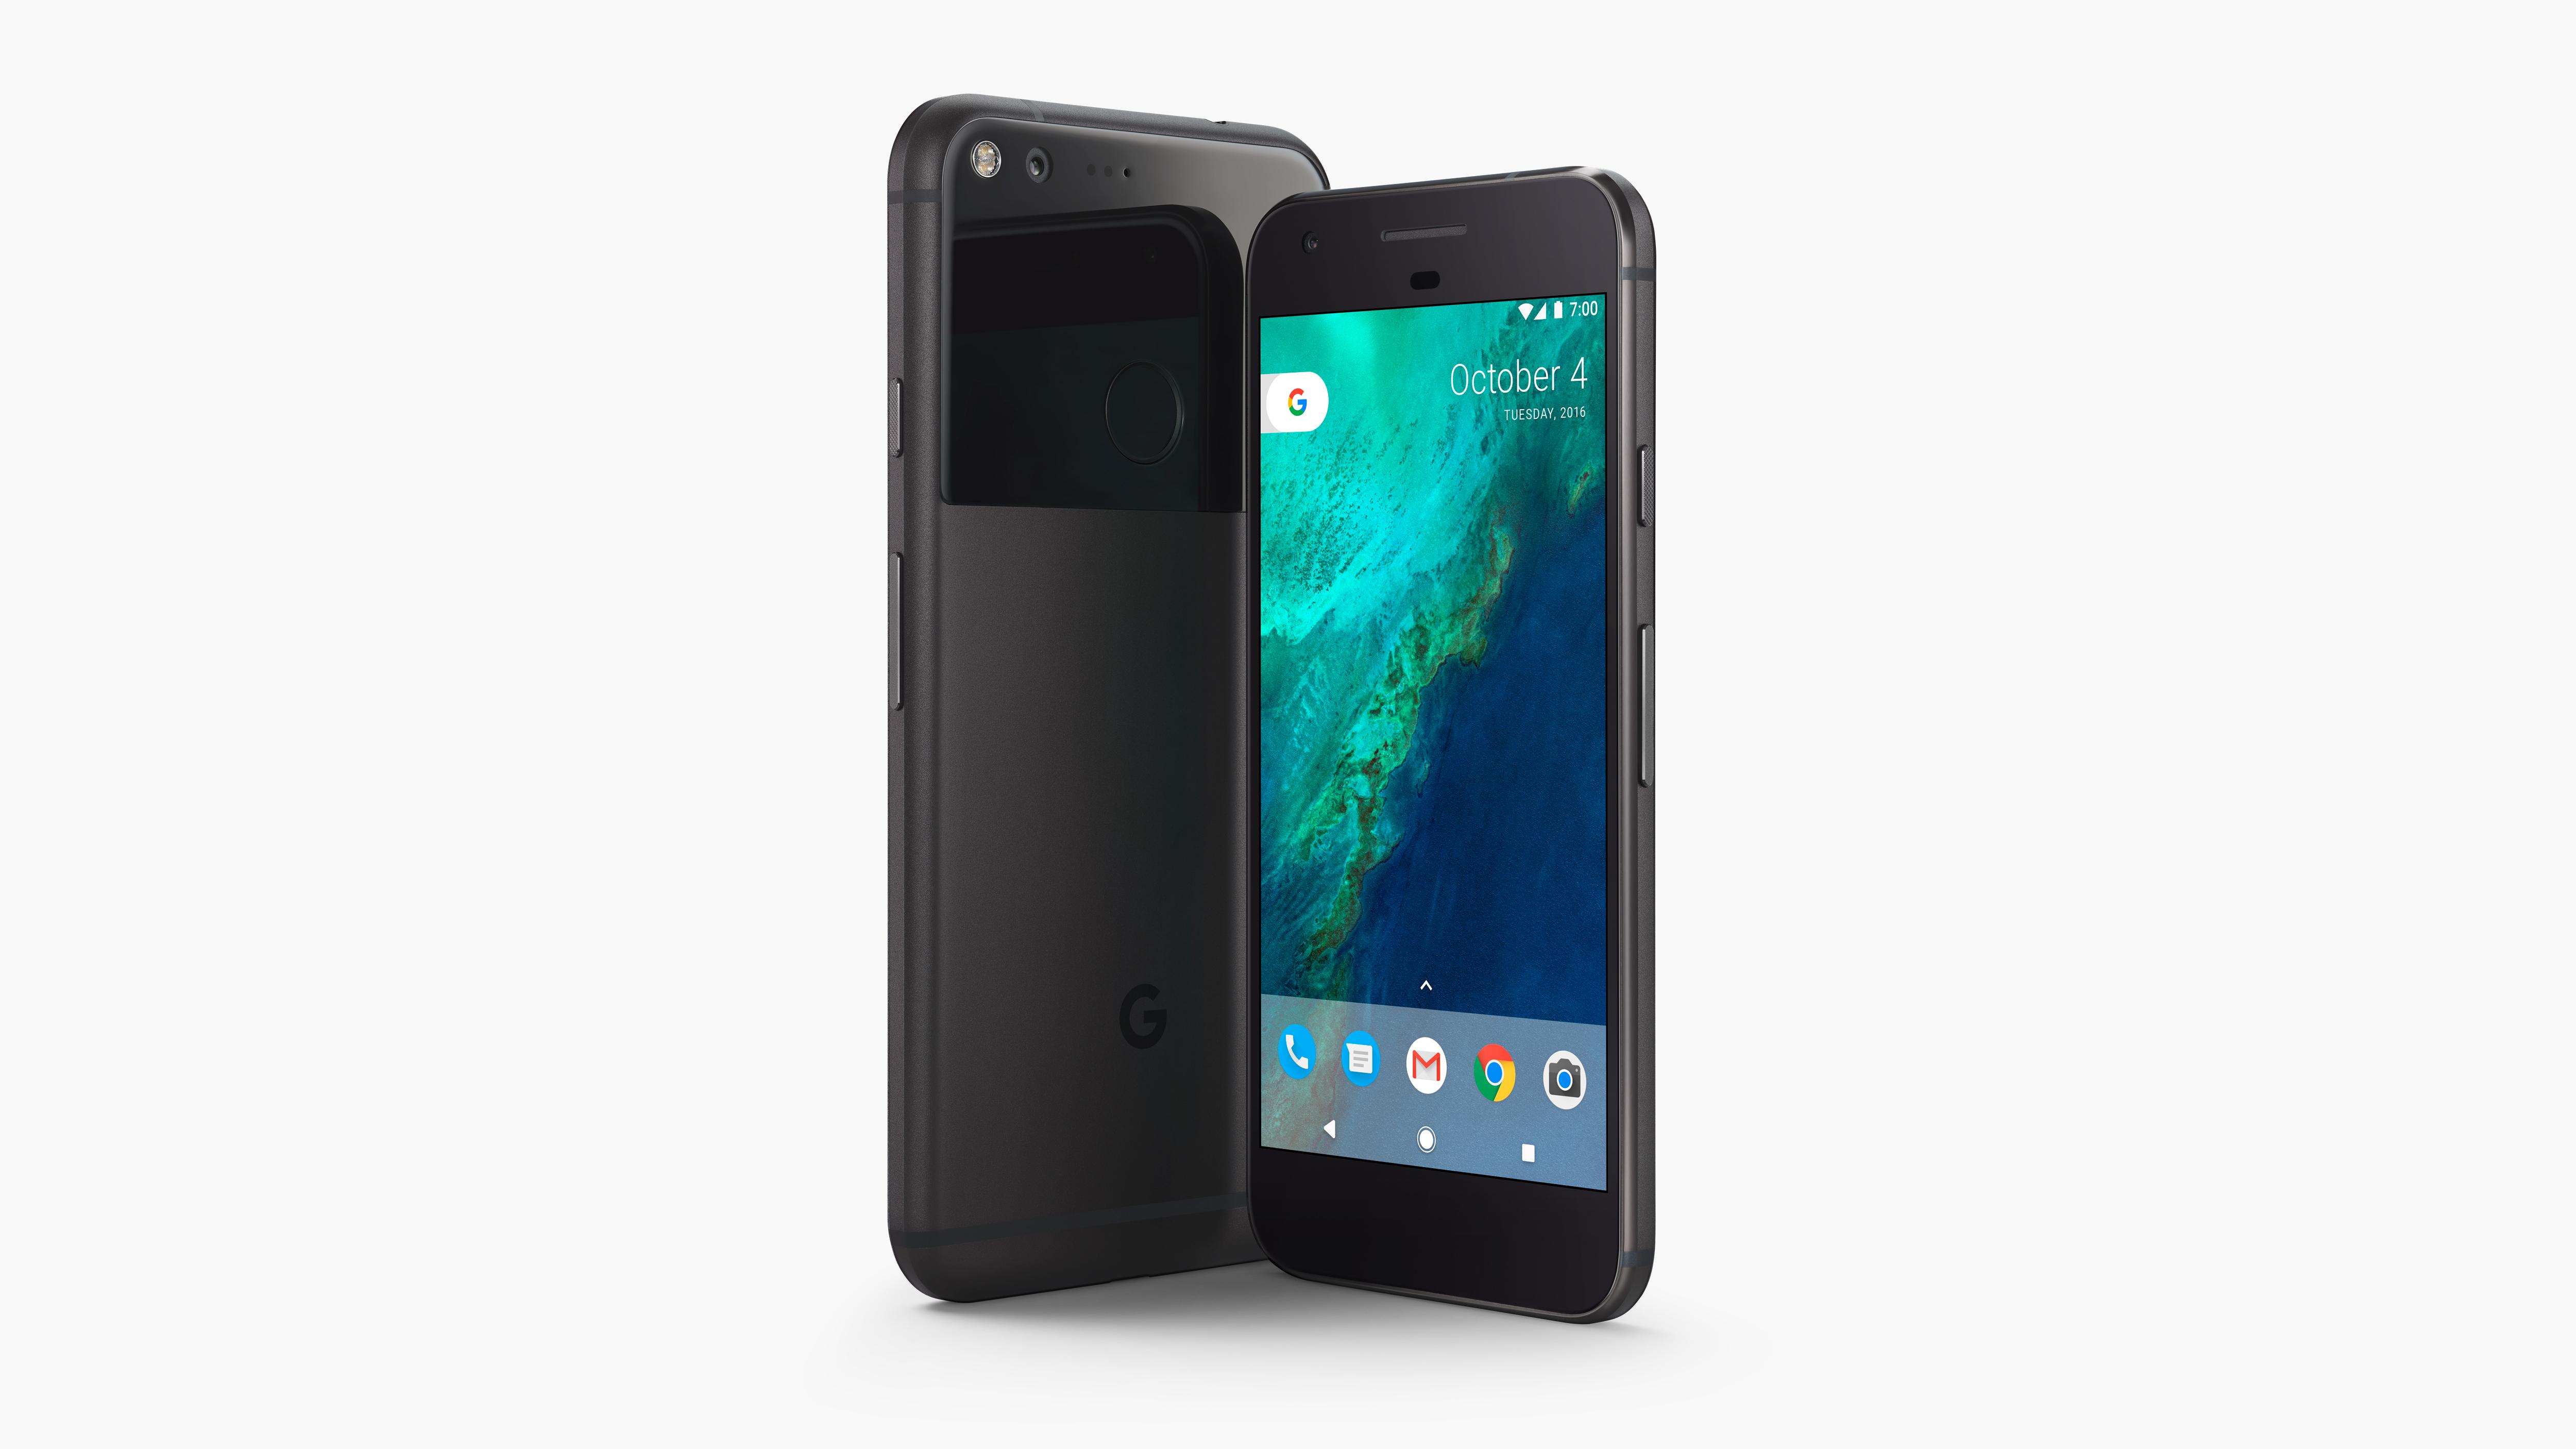 The new Google Pixel smartphone